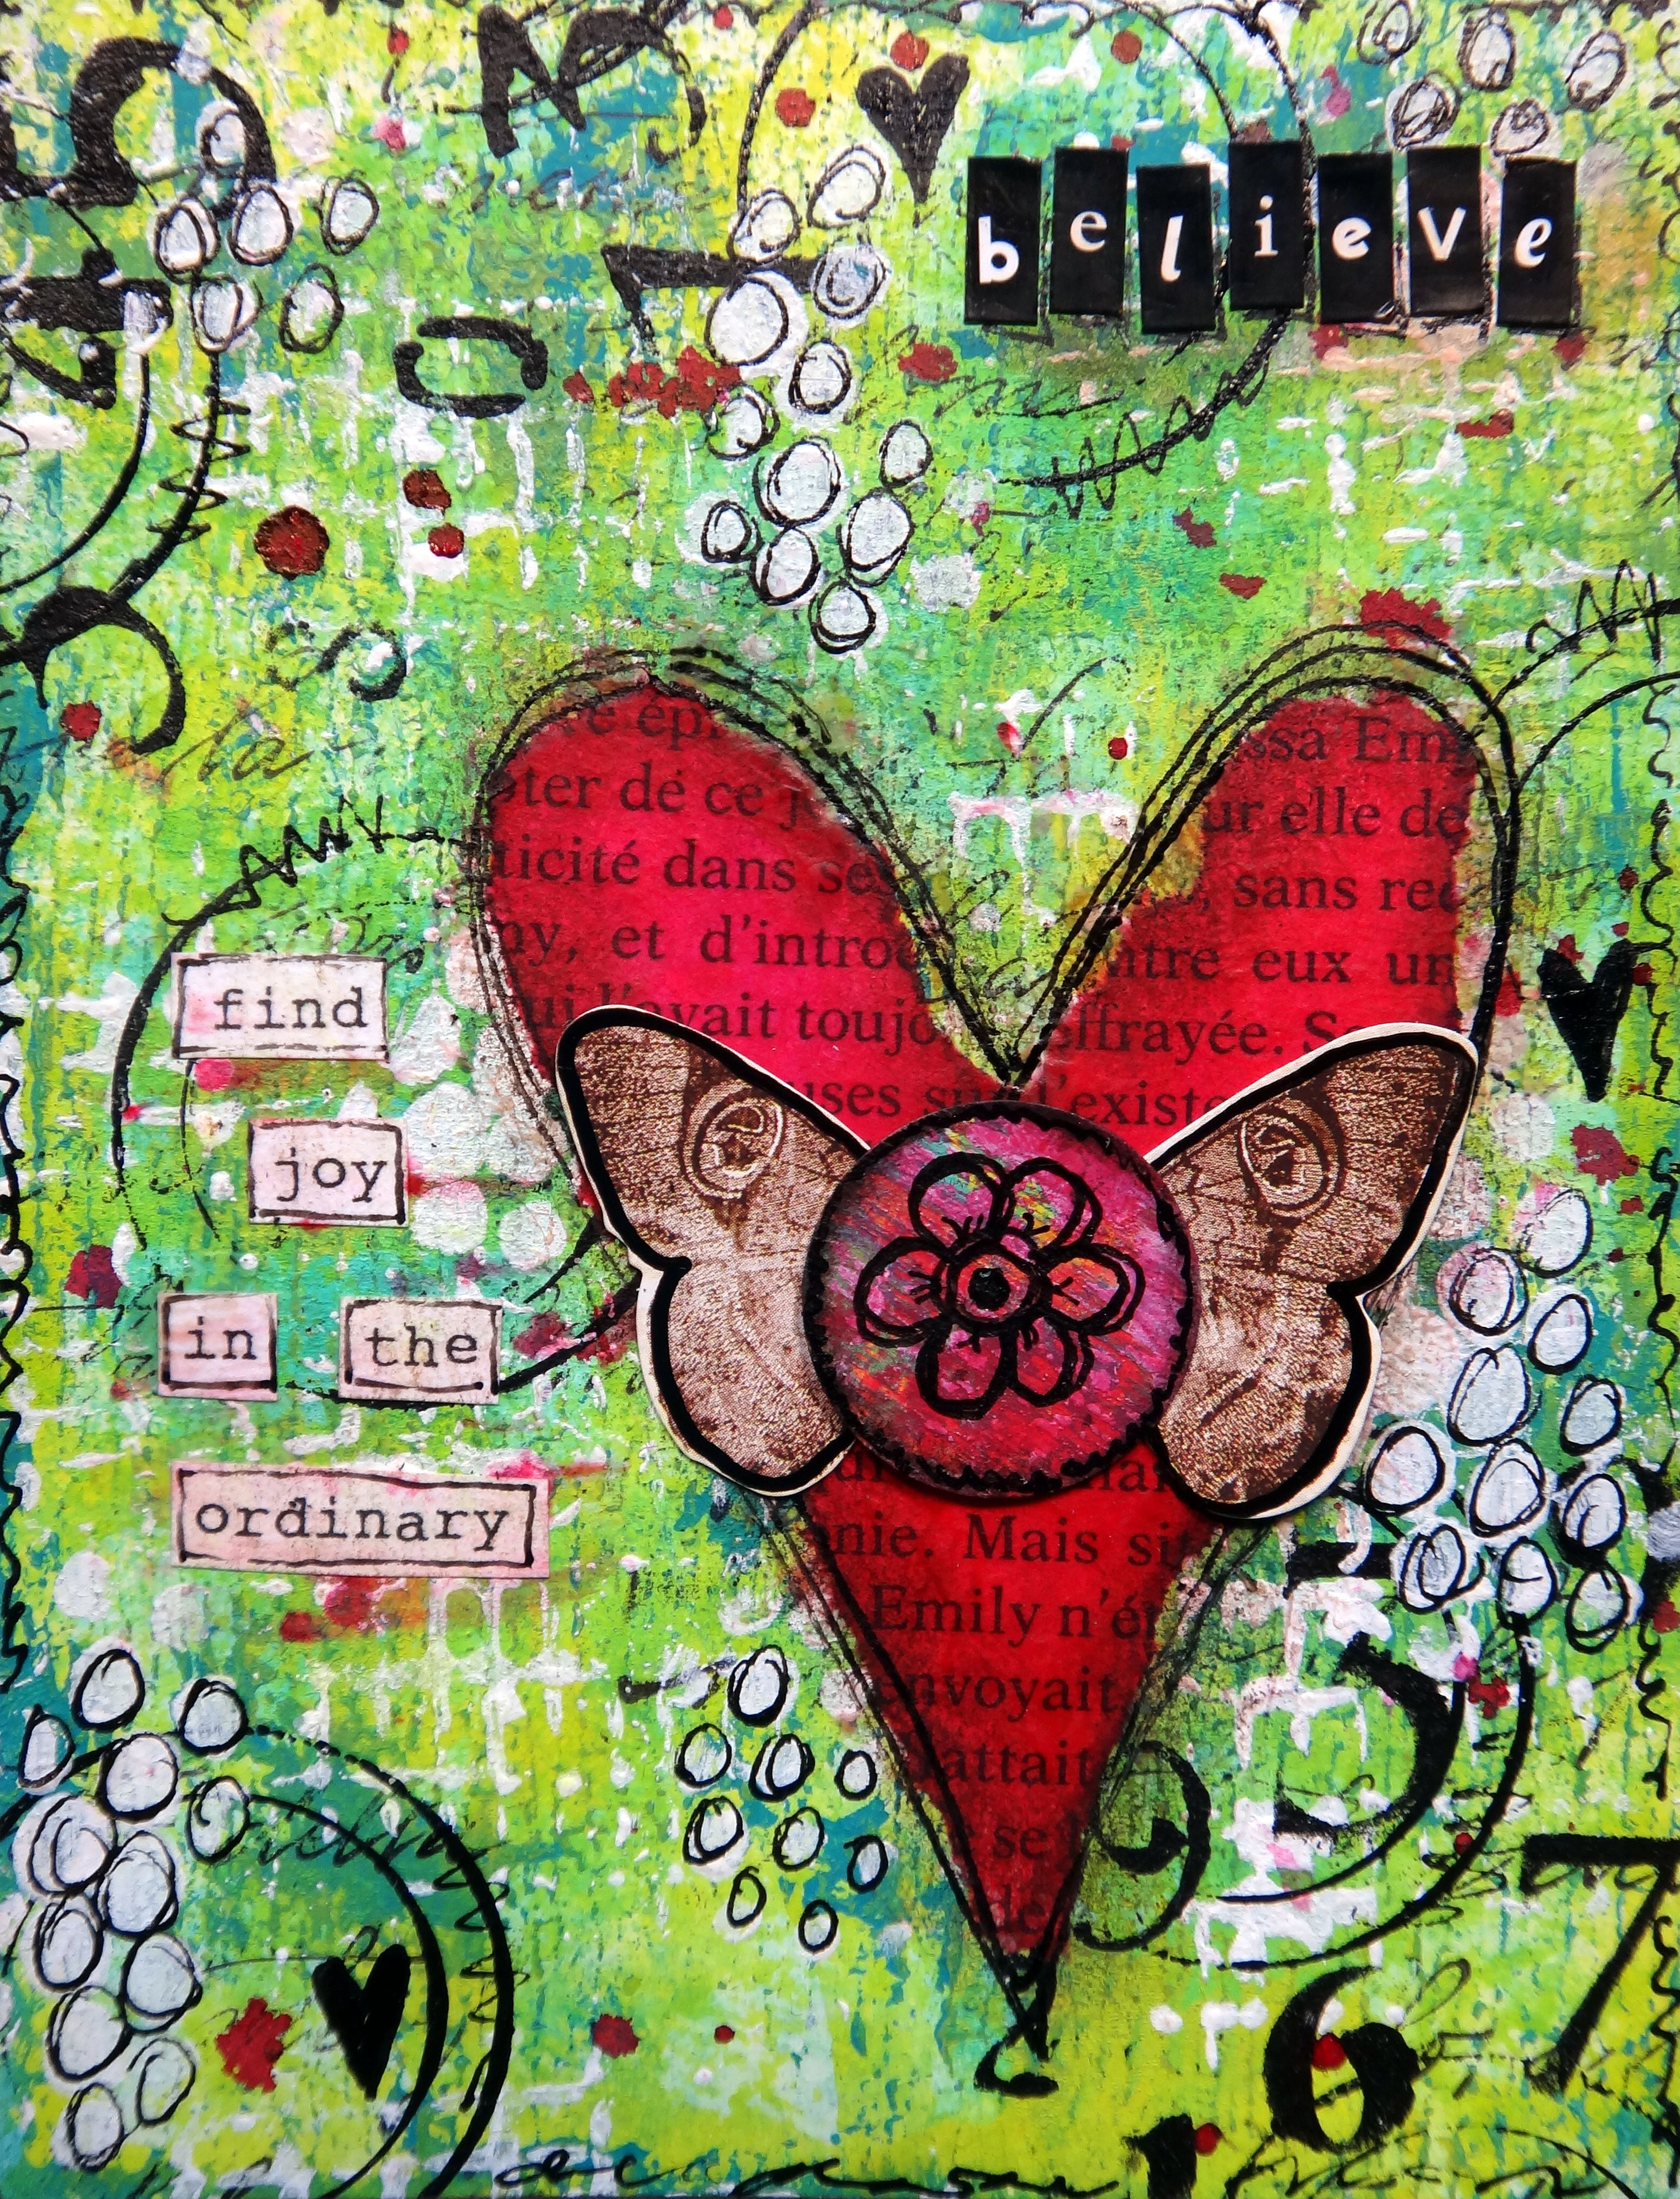 believe - mixed media (heart, butterfly, doodling)  tutorial:  https://www.facebook.com/media/set/?set=a.232211226903070.1073741879.210808819043311&type=3